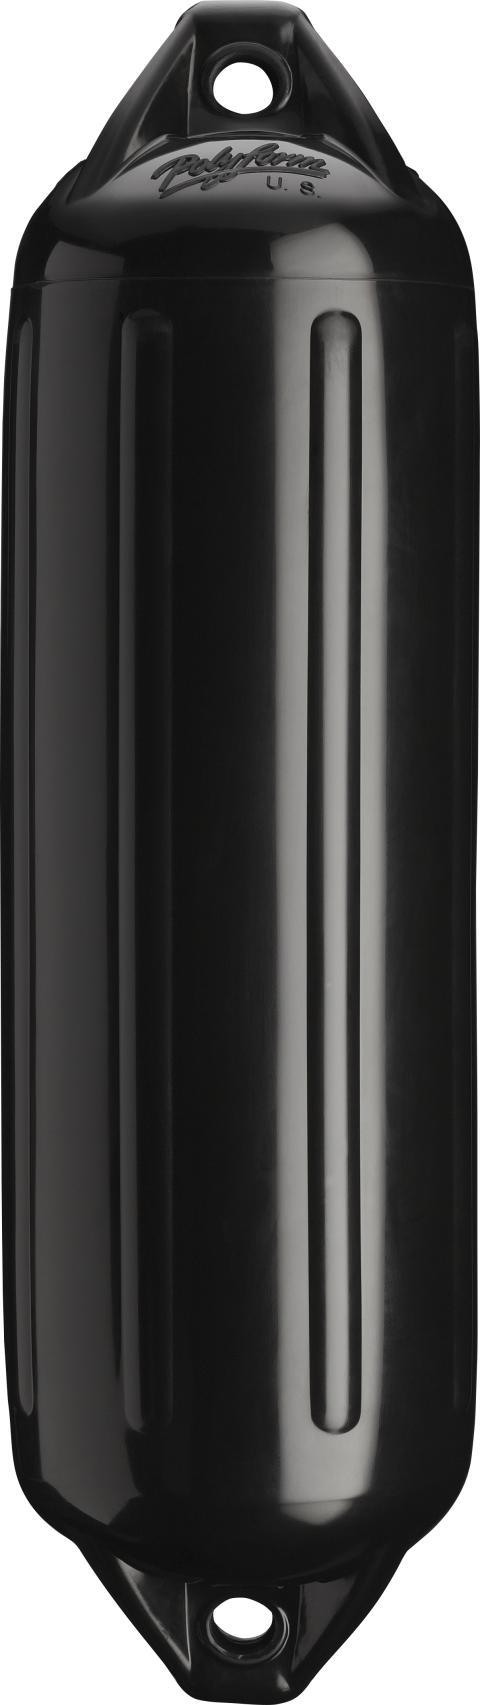 Polyform US : NF-fender NF4 svart